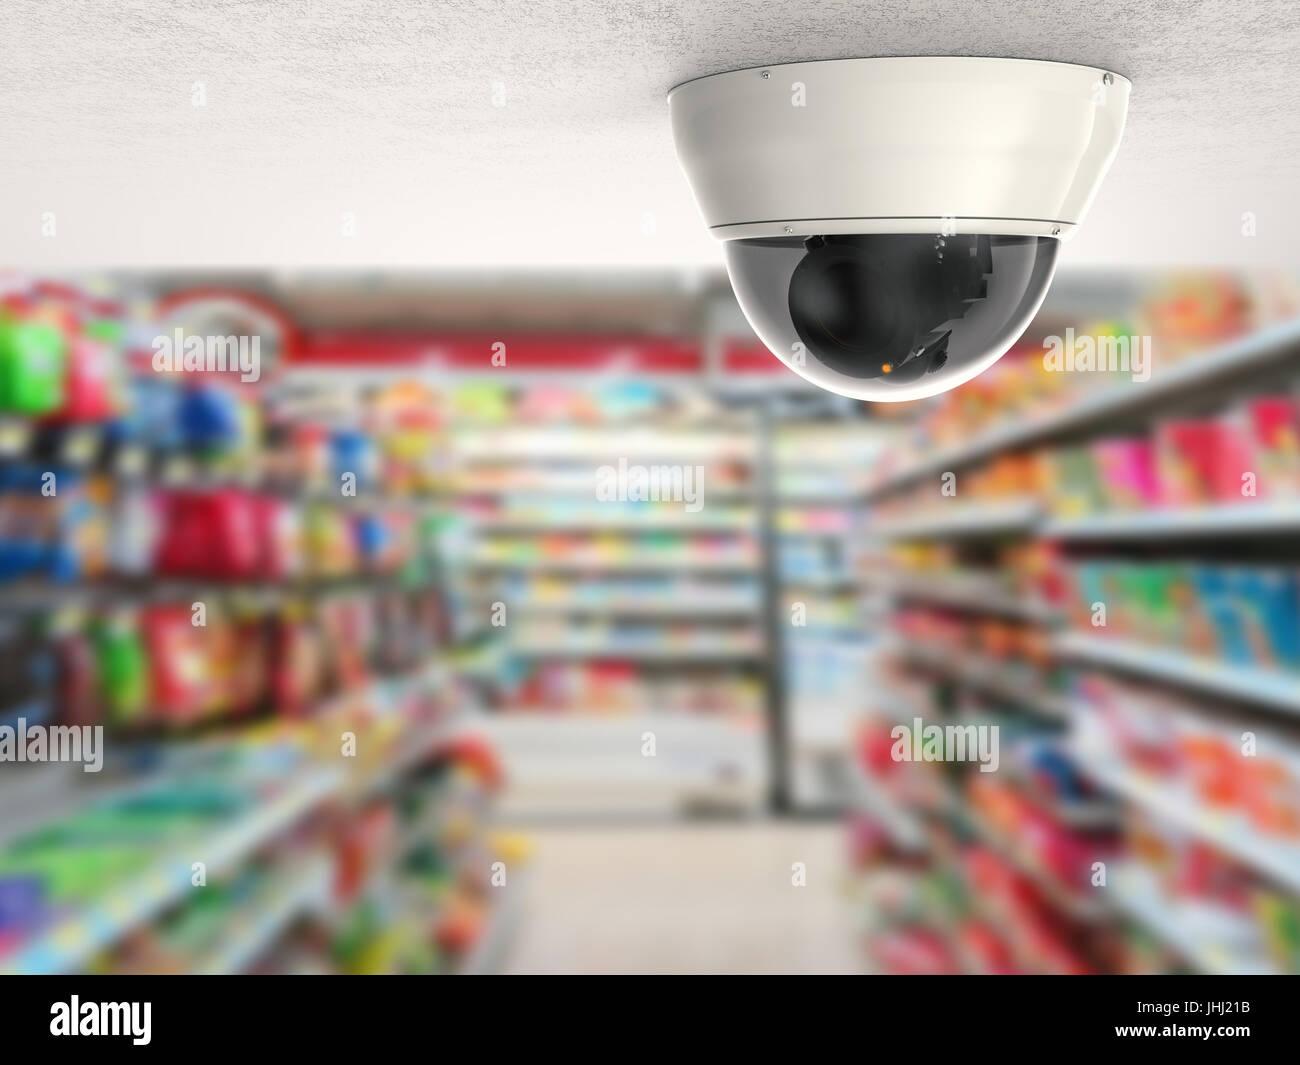 Security Store Near Me >> Cctv Camera Shop Near Me